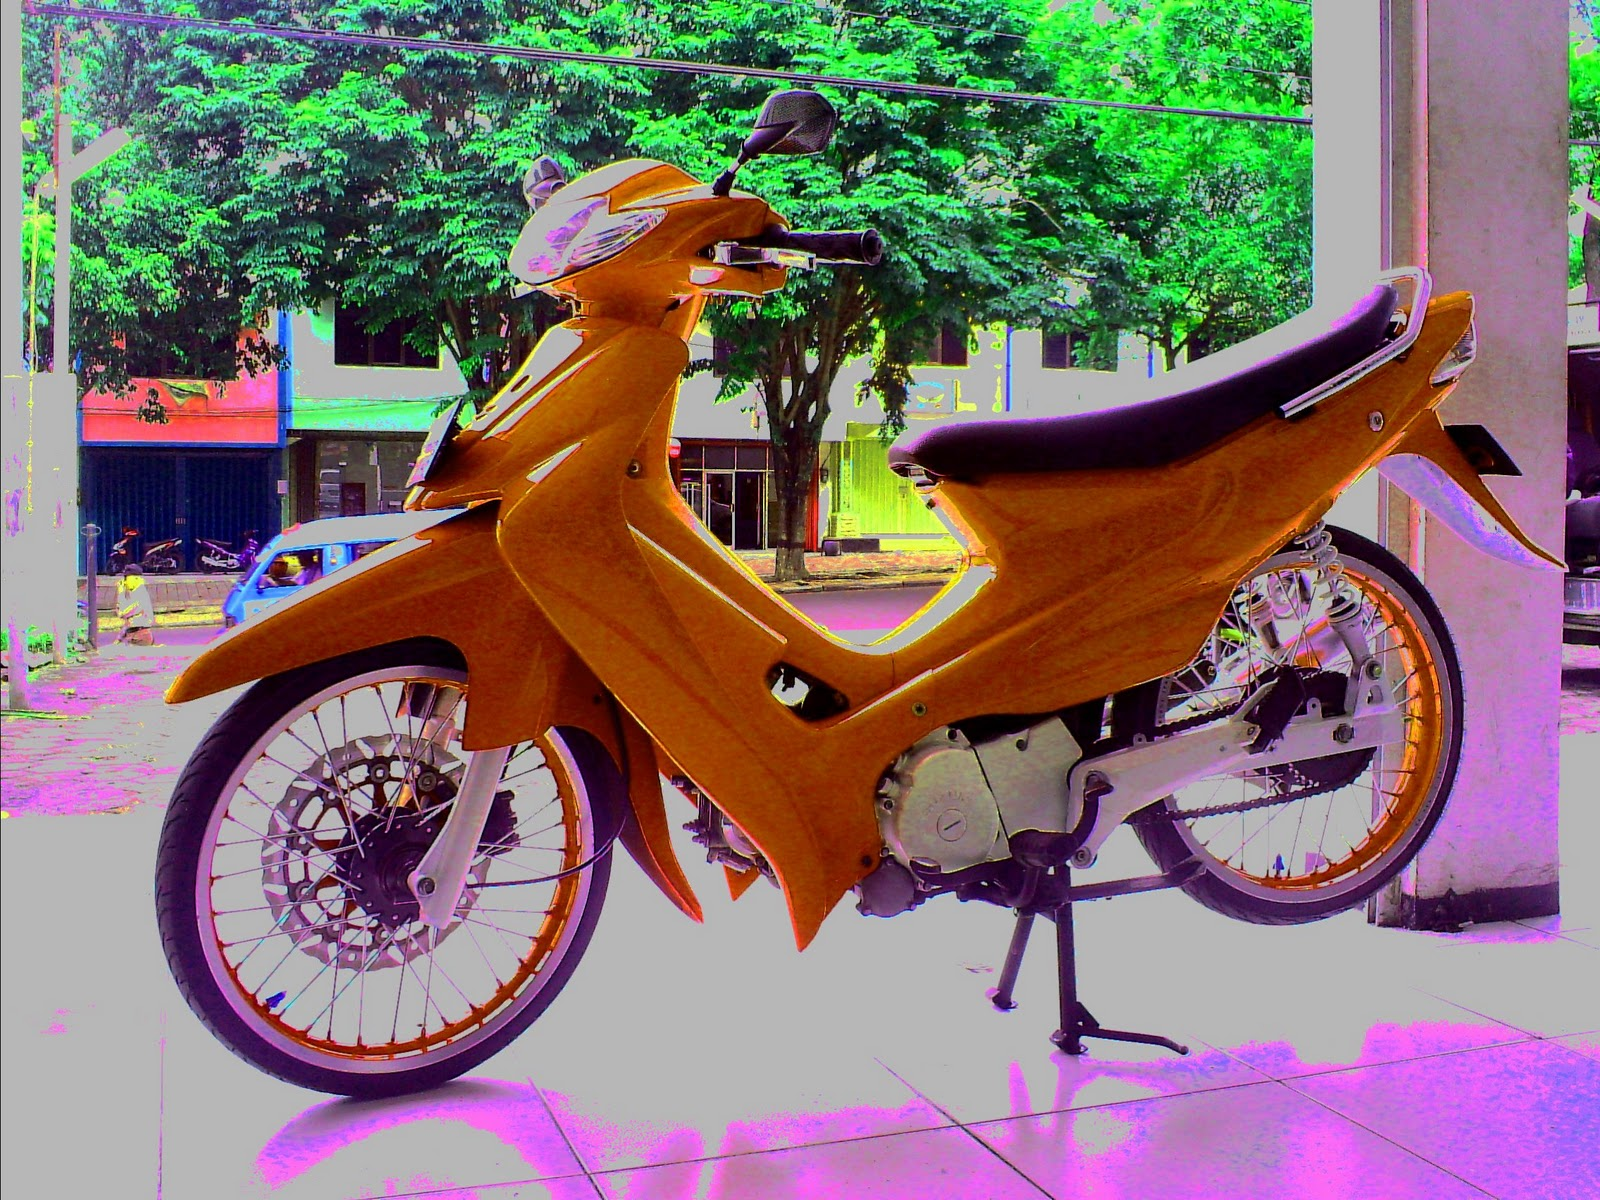 Suzuki Motorcycle pictures